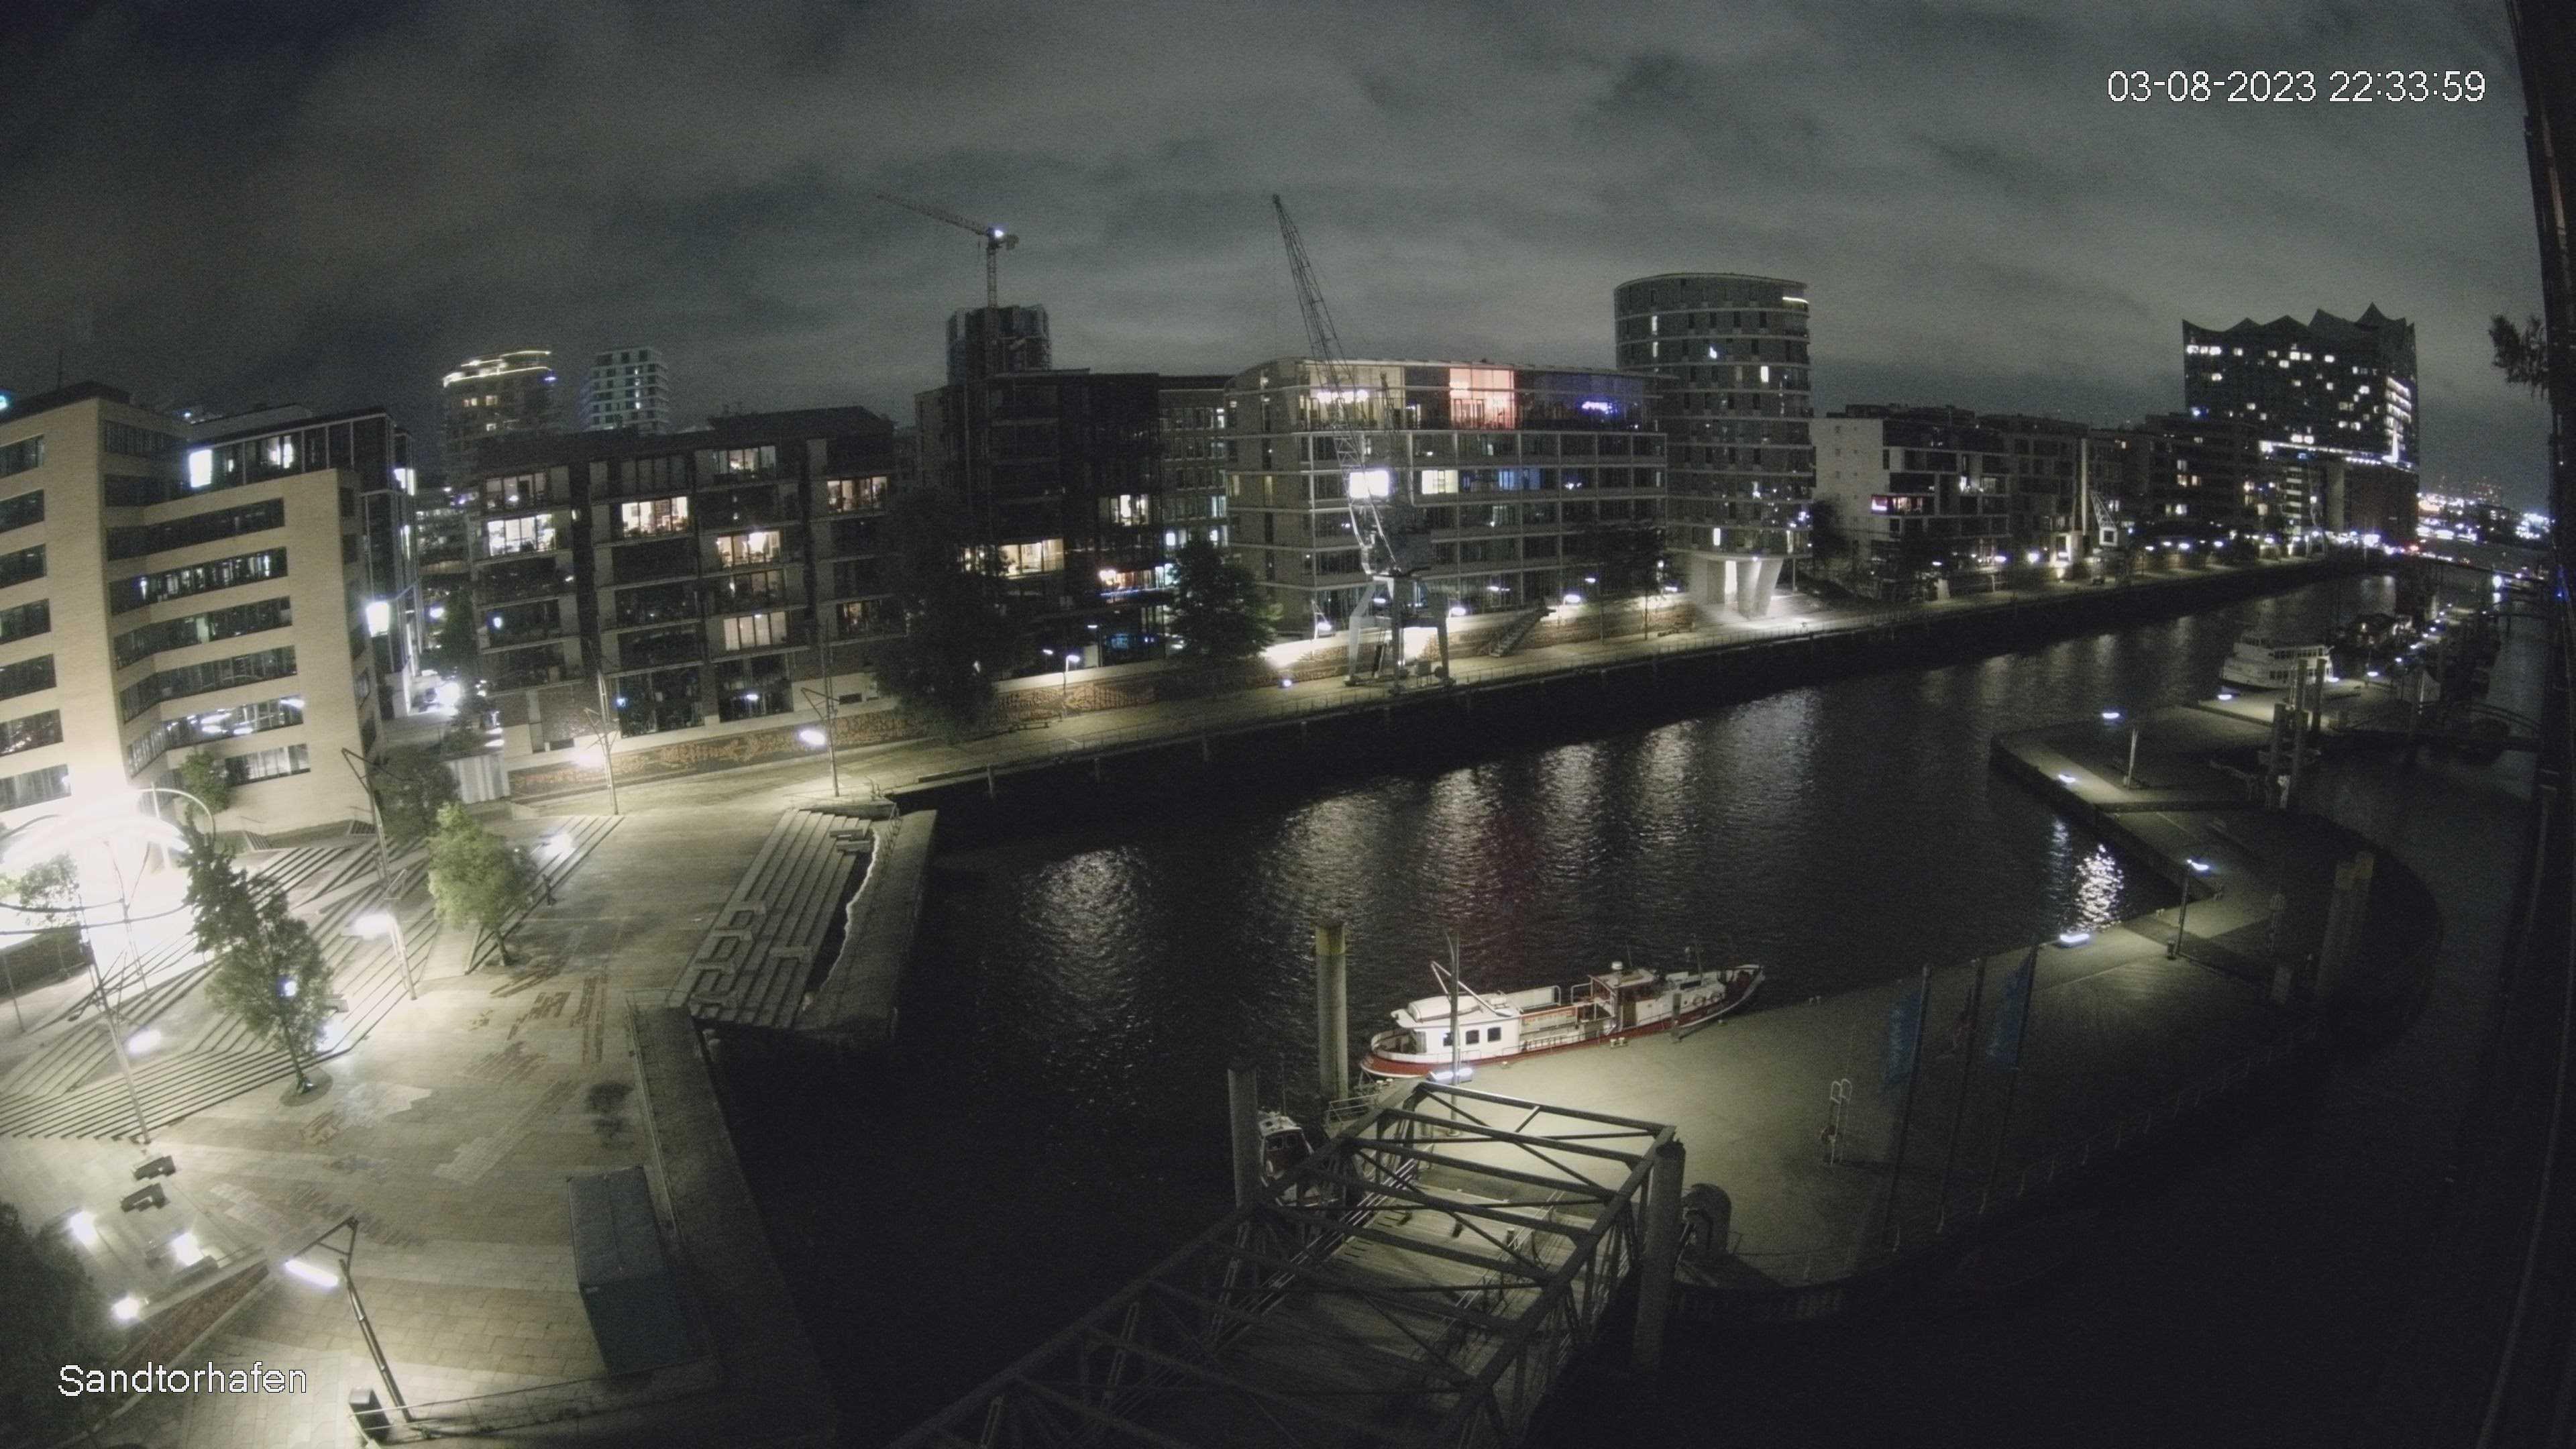 Hamburg Wed. 22:35